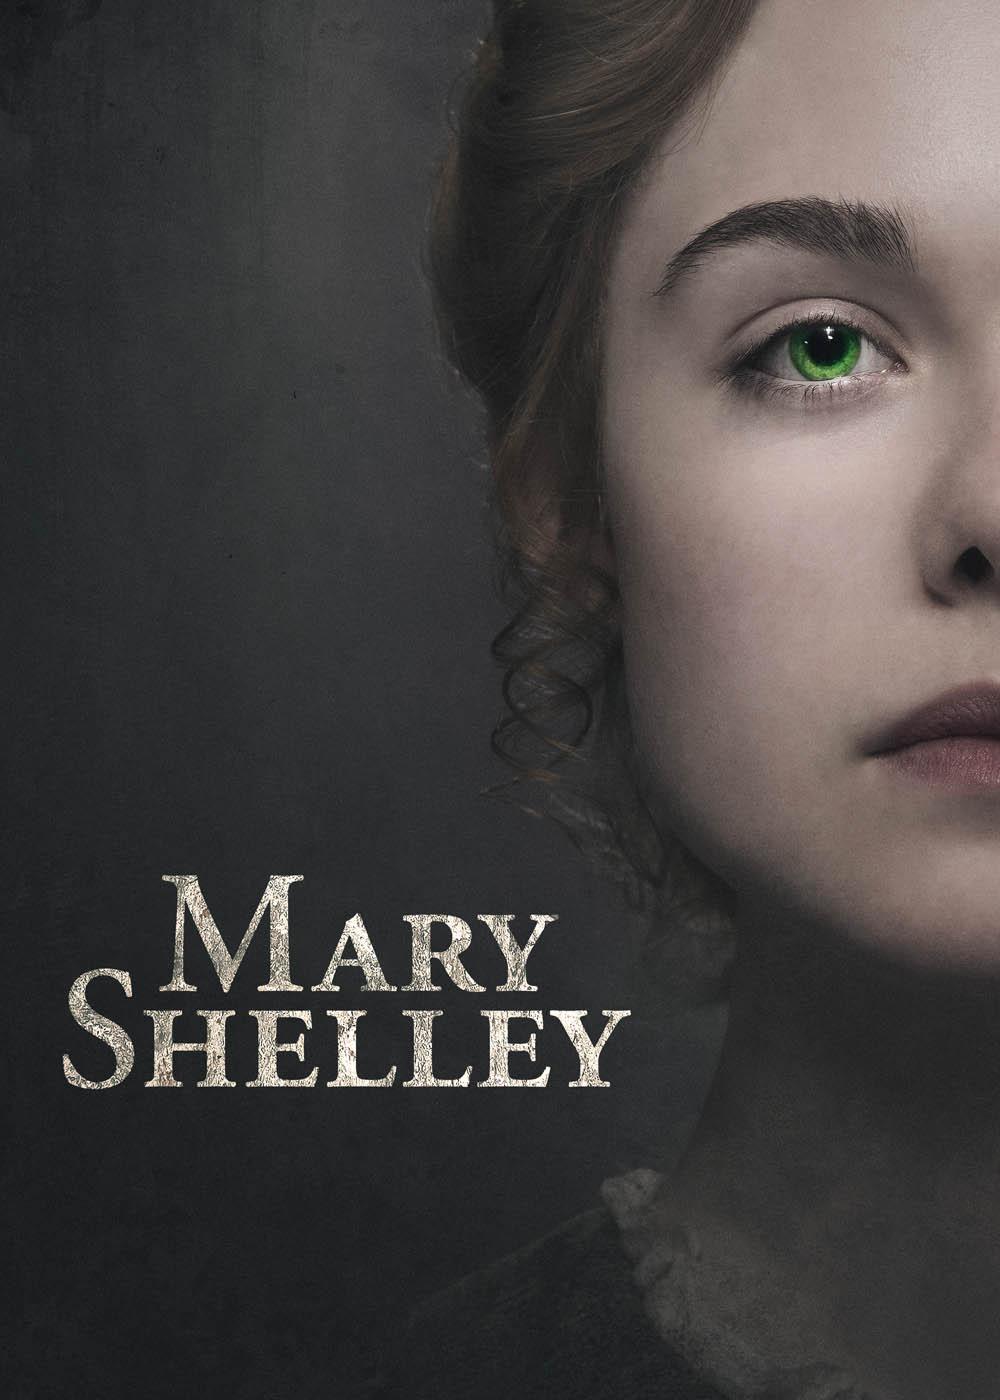 maryshelley_poster.jpg